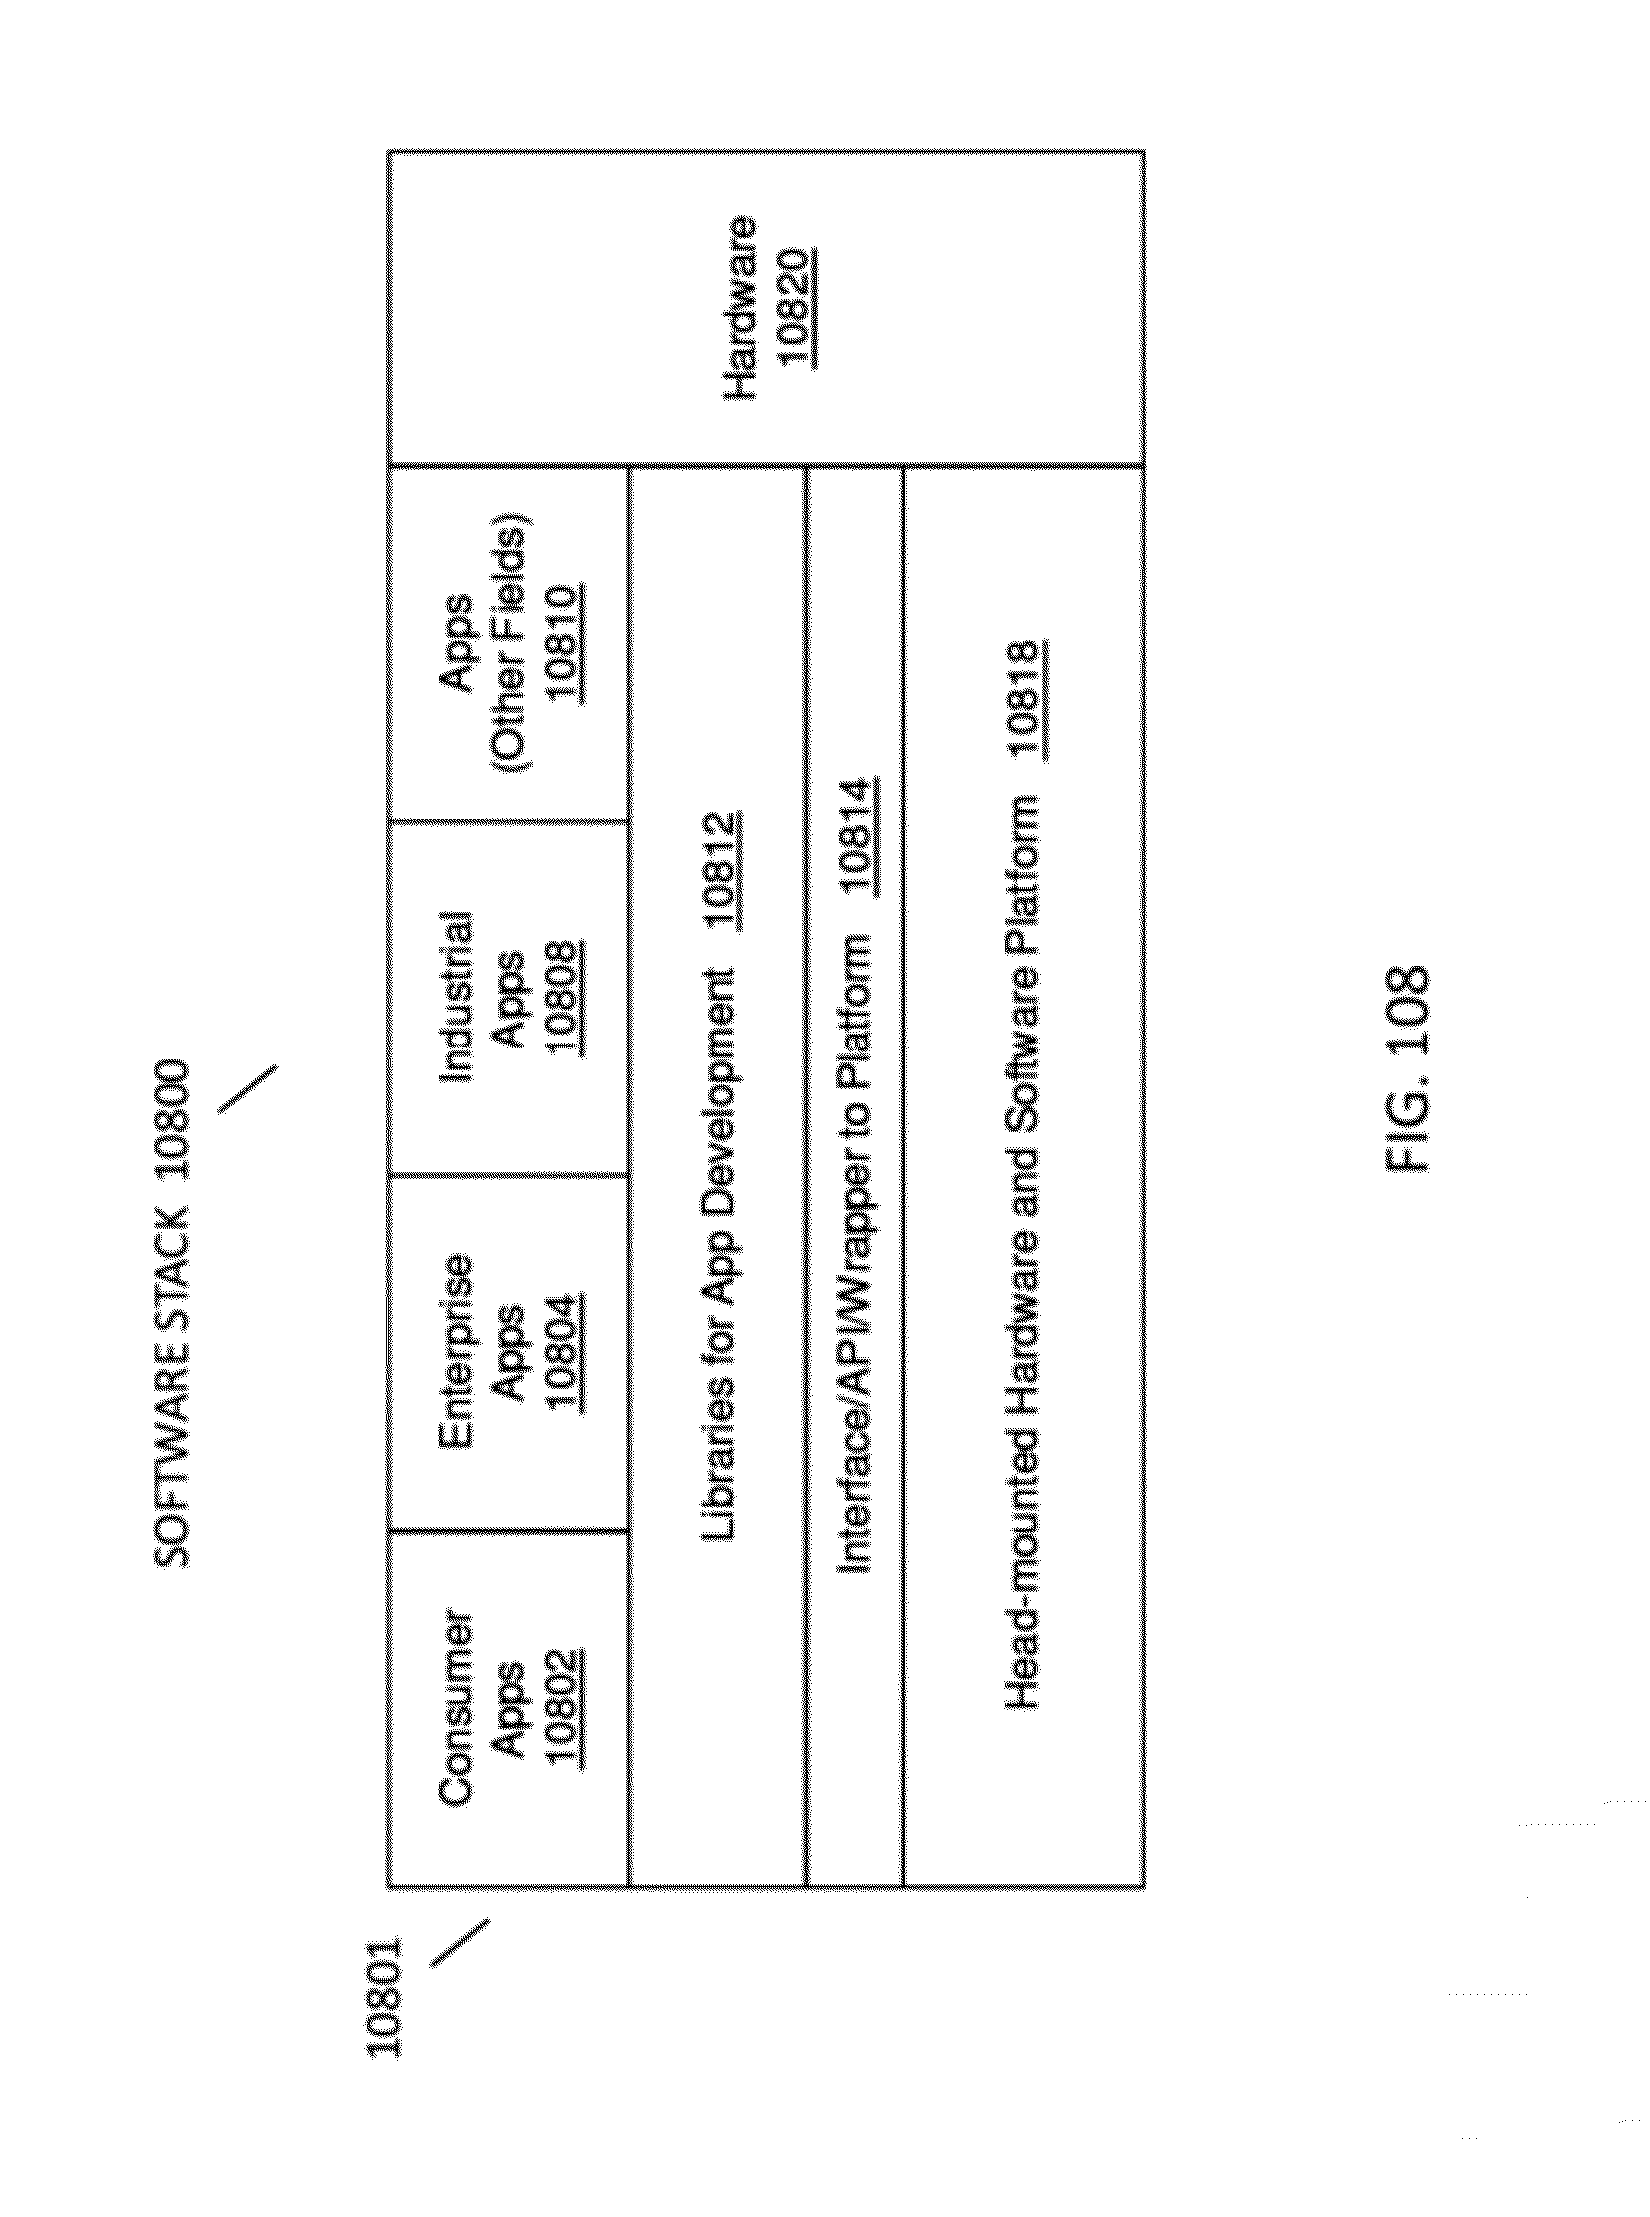 Patent US 8,477,425 B2